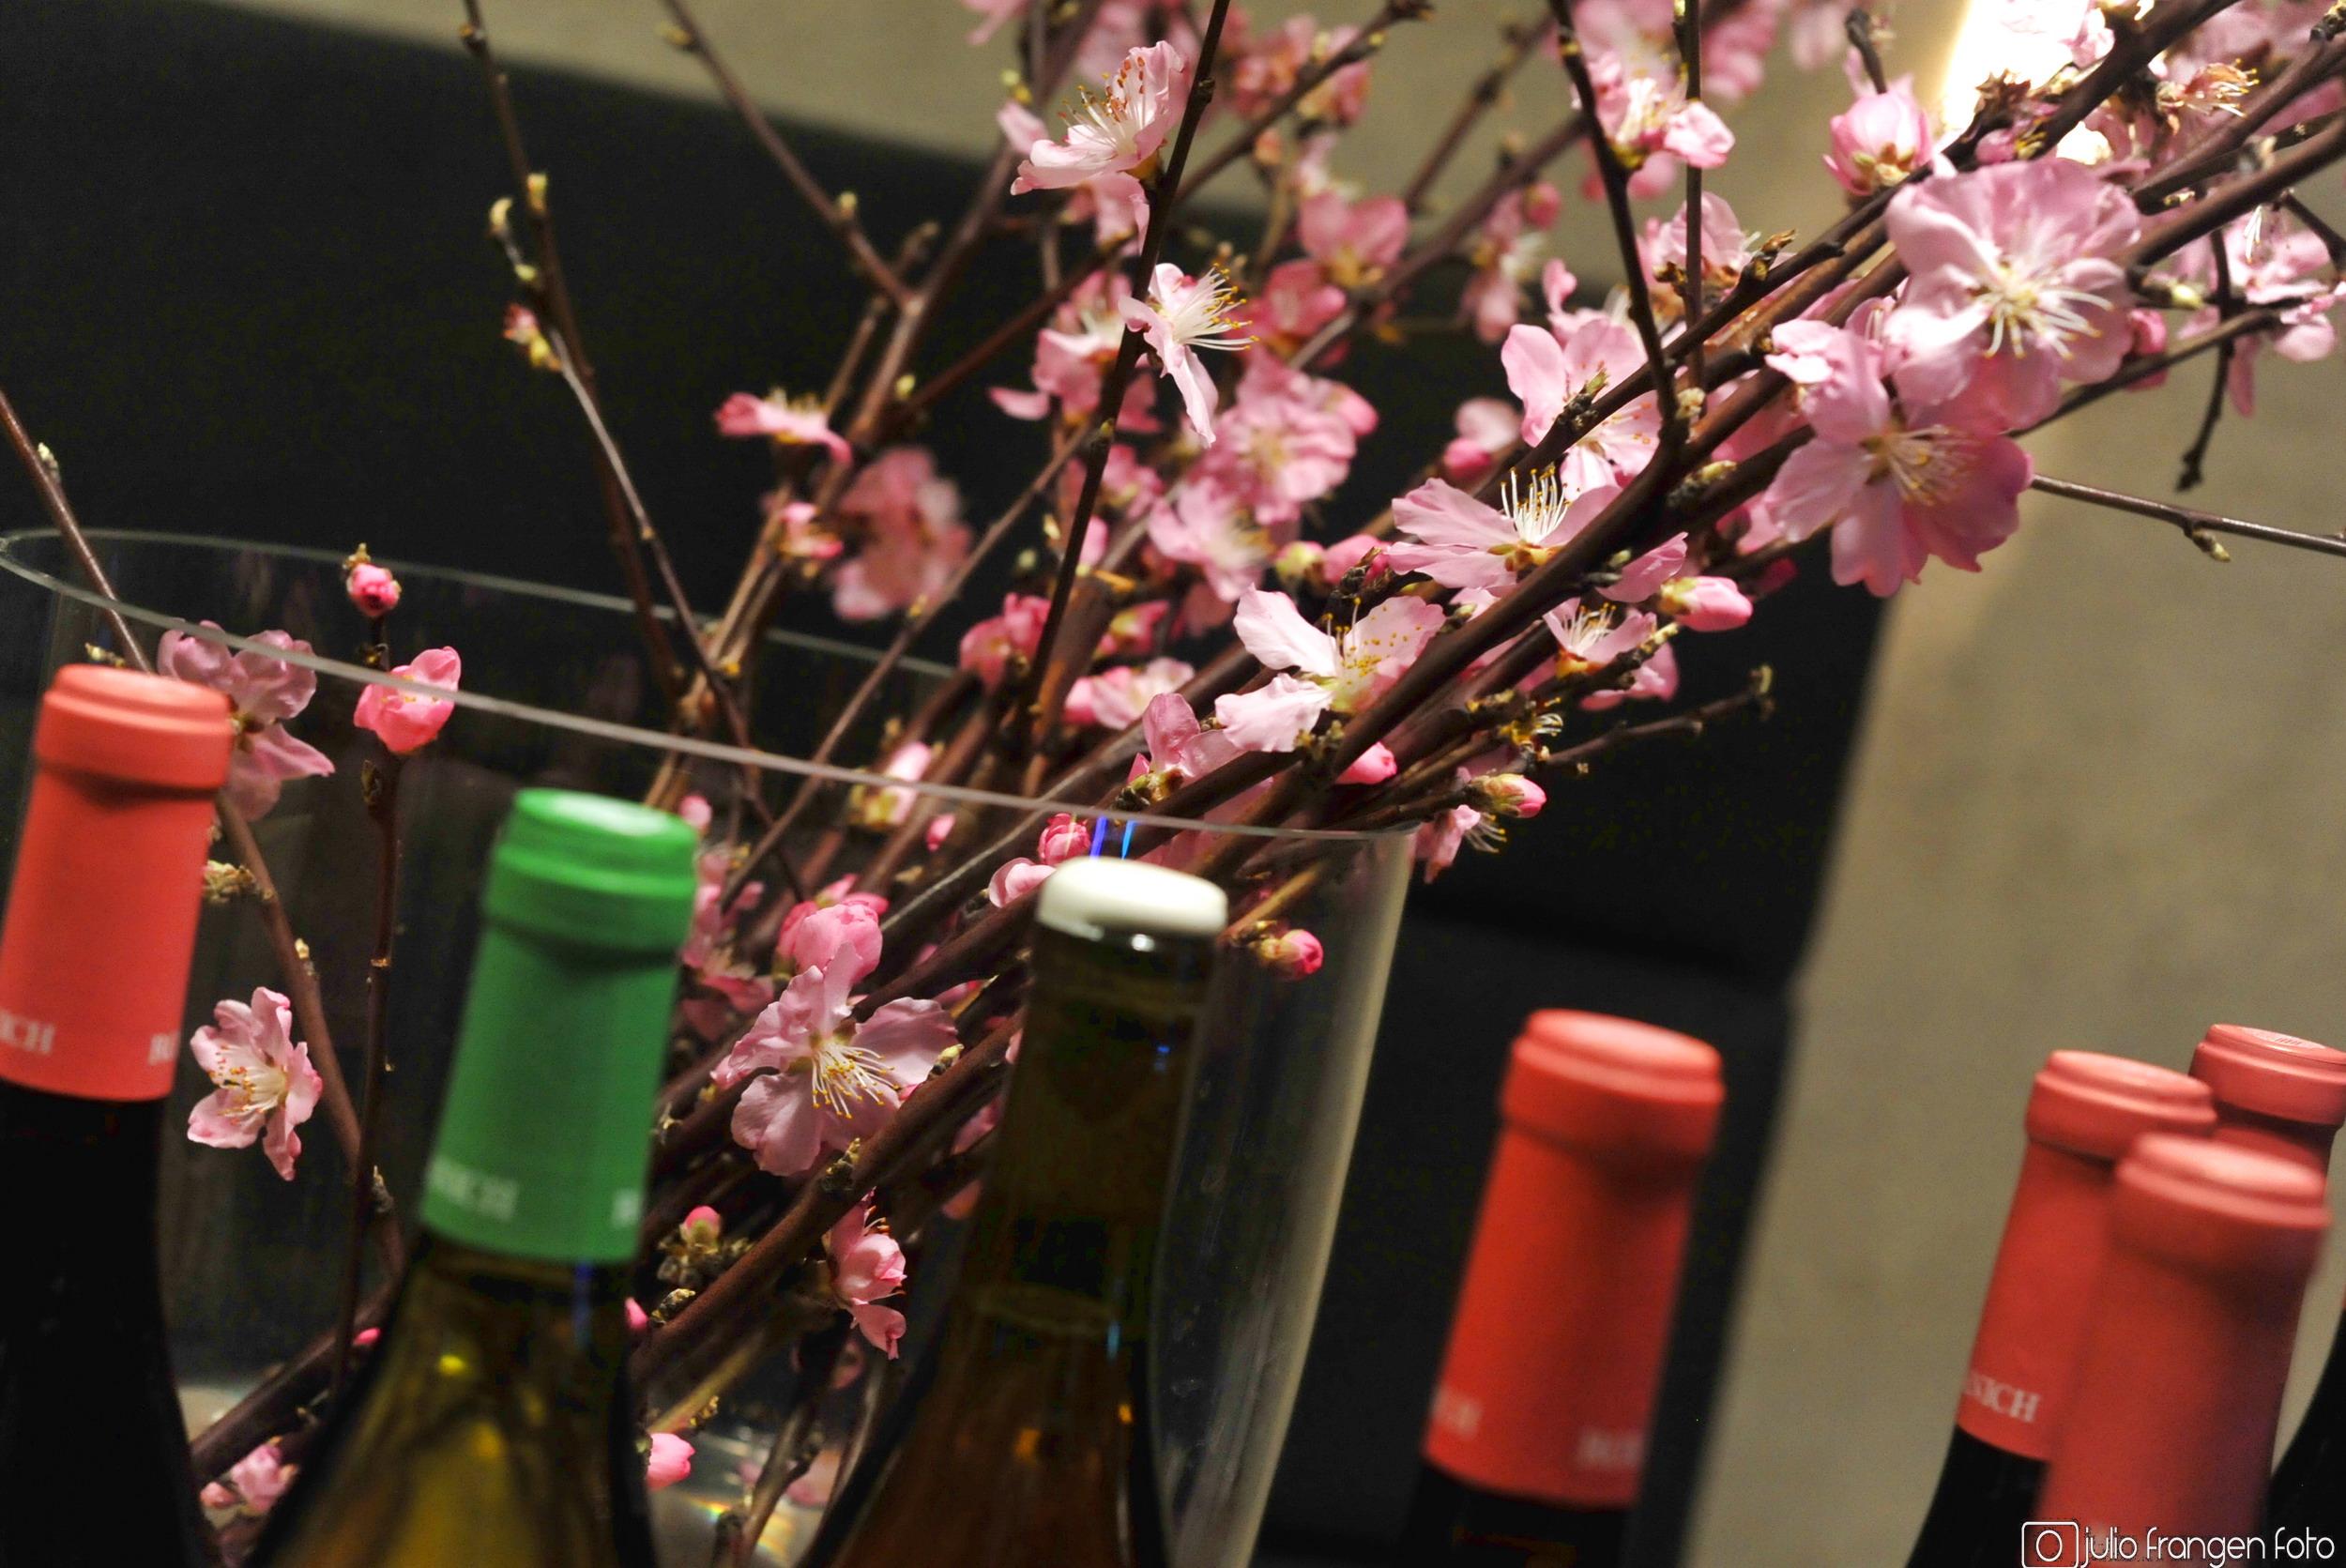 Roxanich vina Pod zidom – uz vinara s ružom!